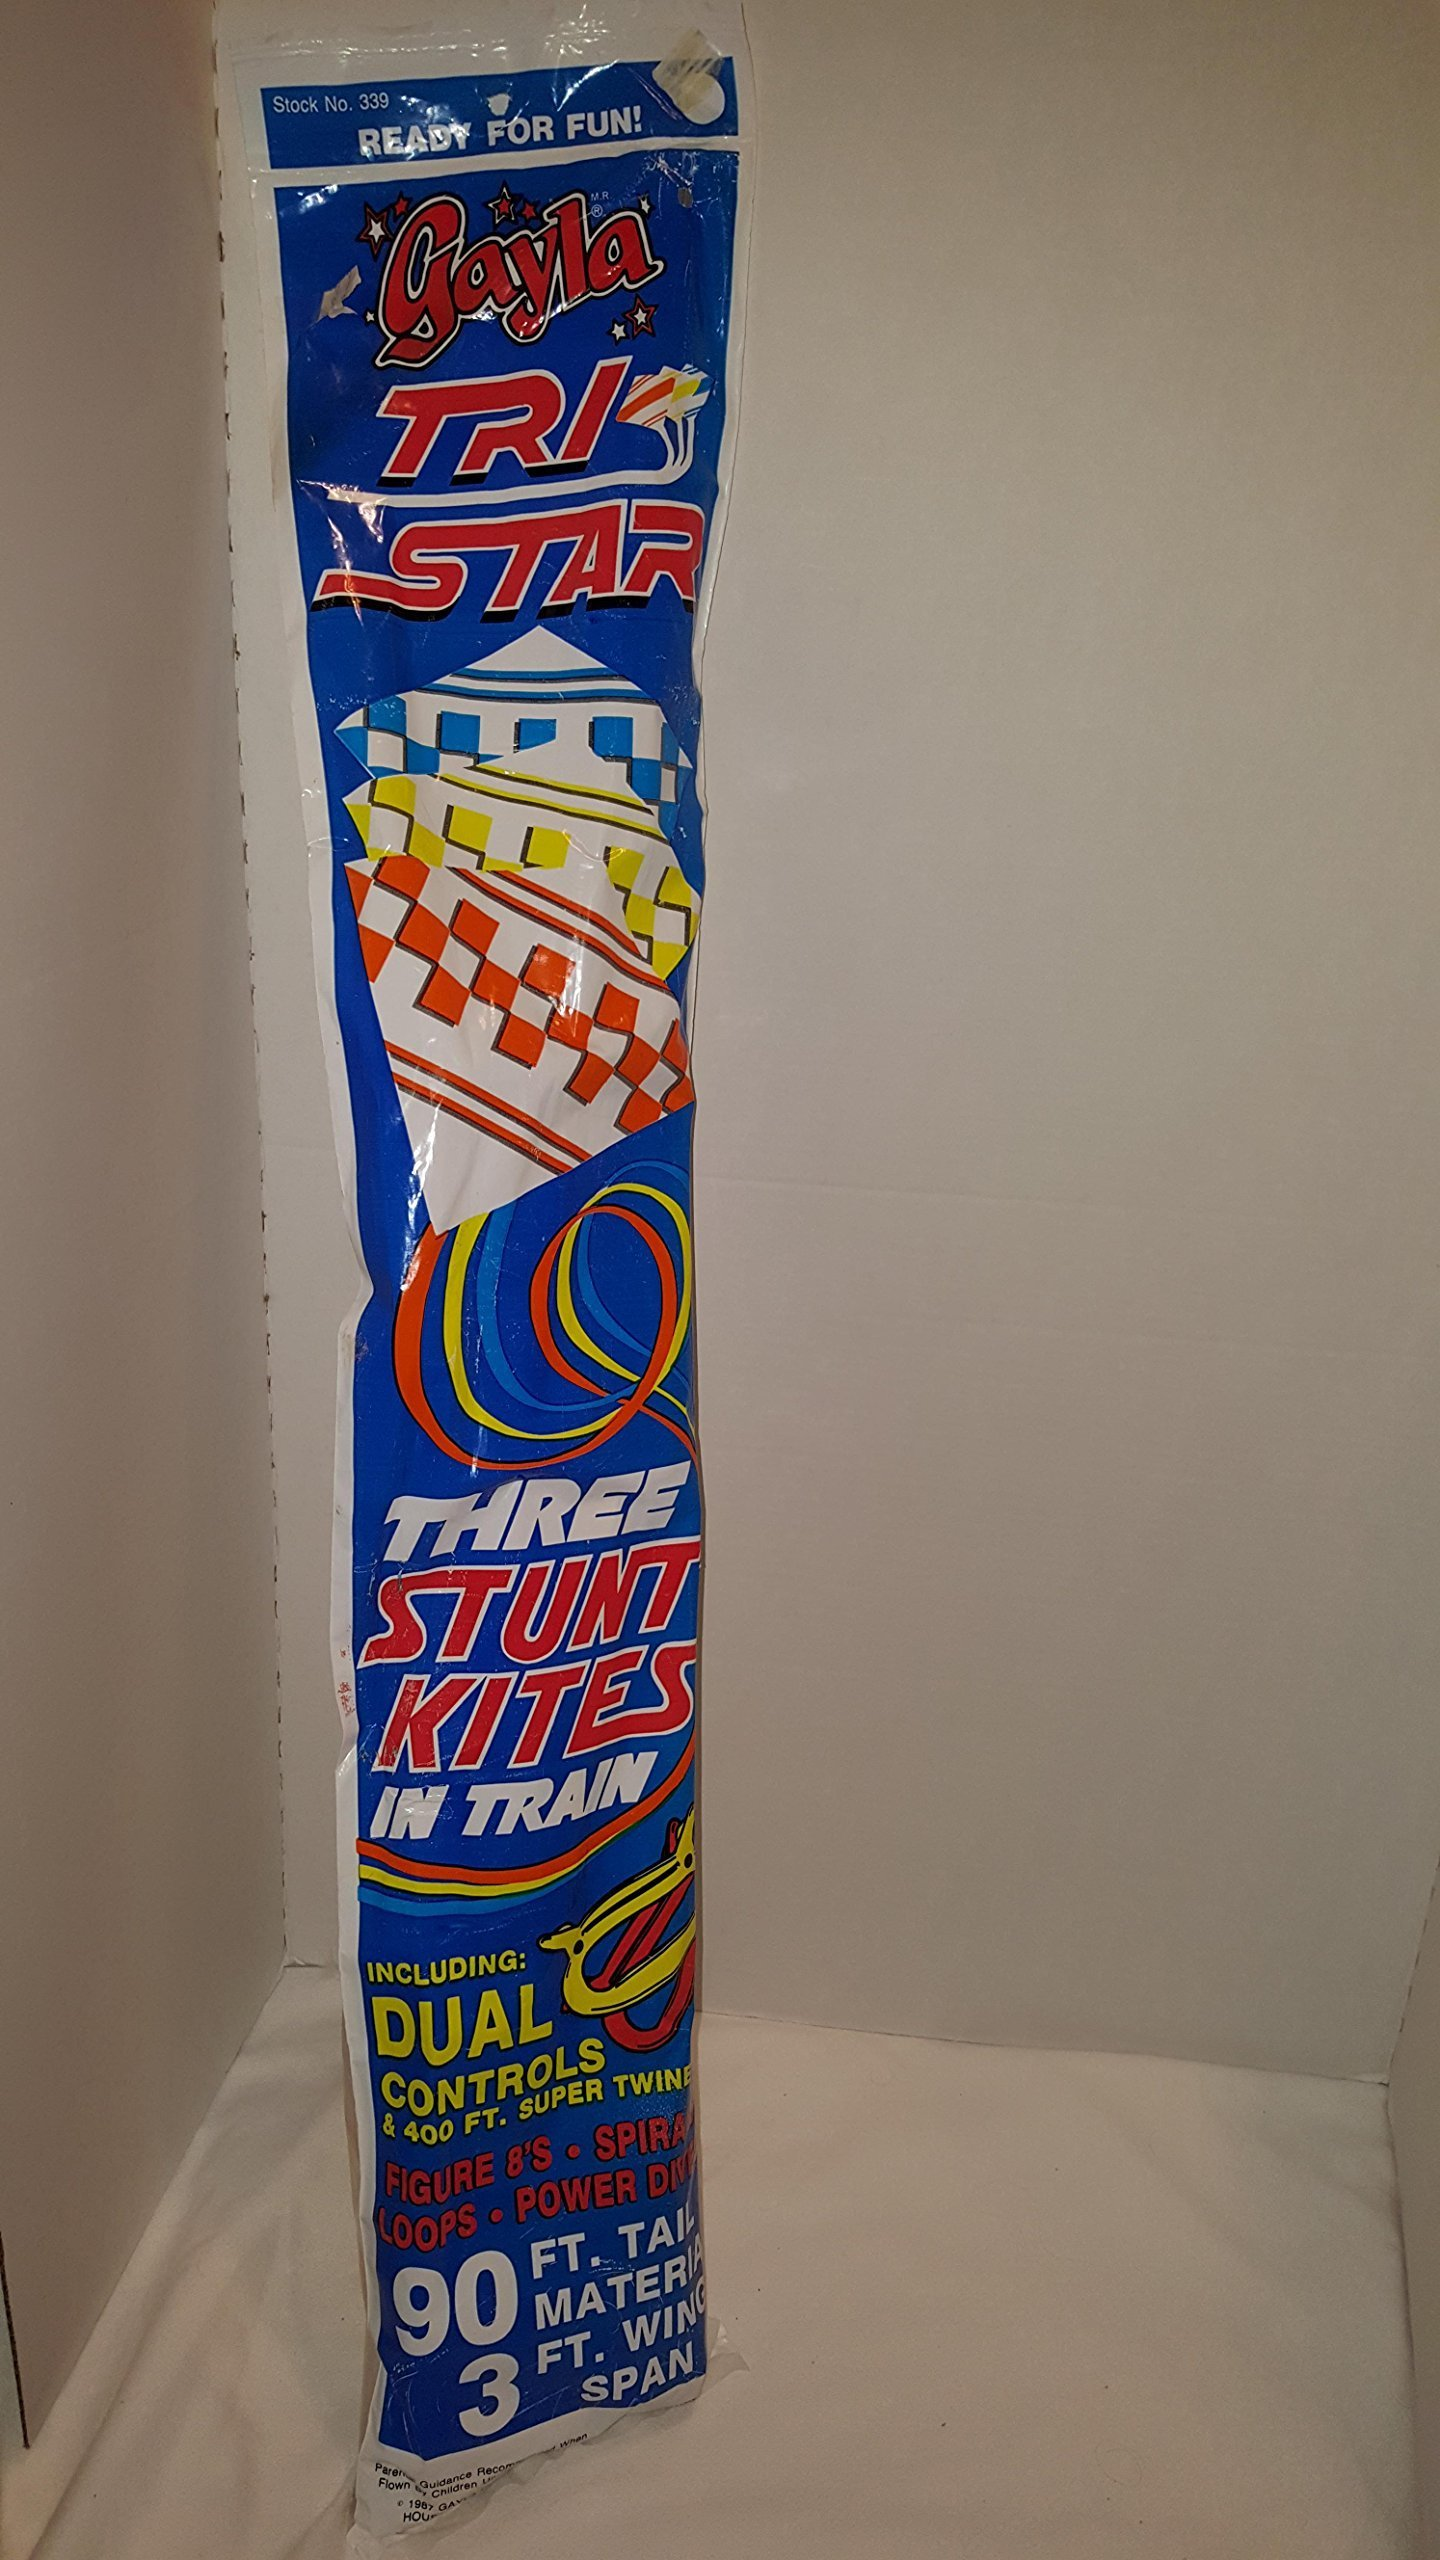 1987 Gayla Tri-star 3 Stunt Kites In Train by Unknown